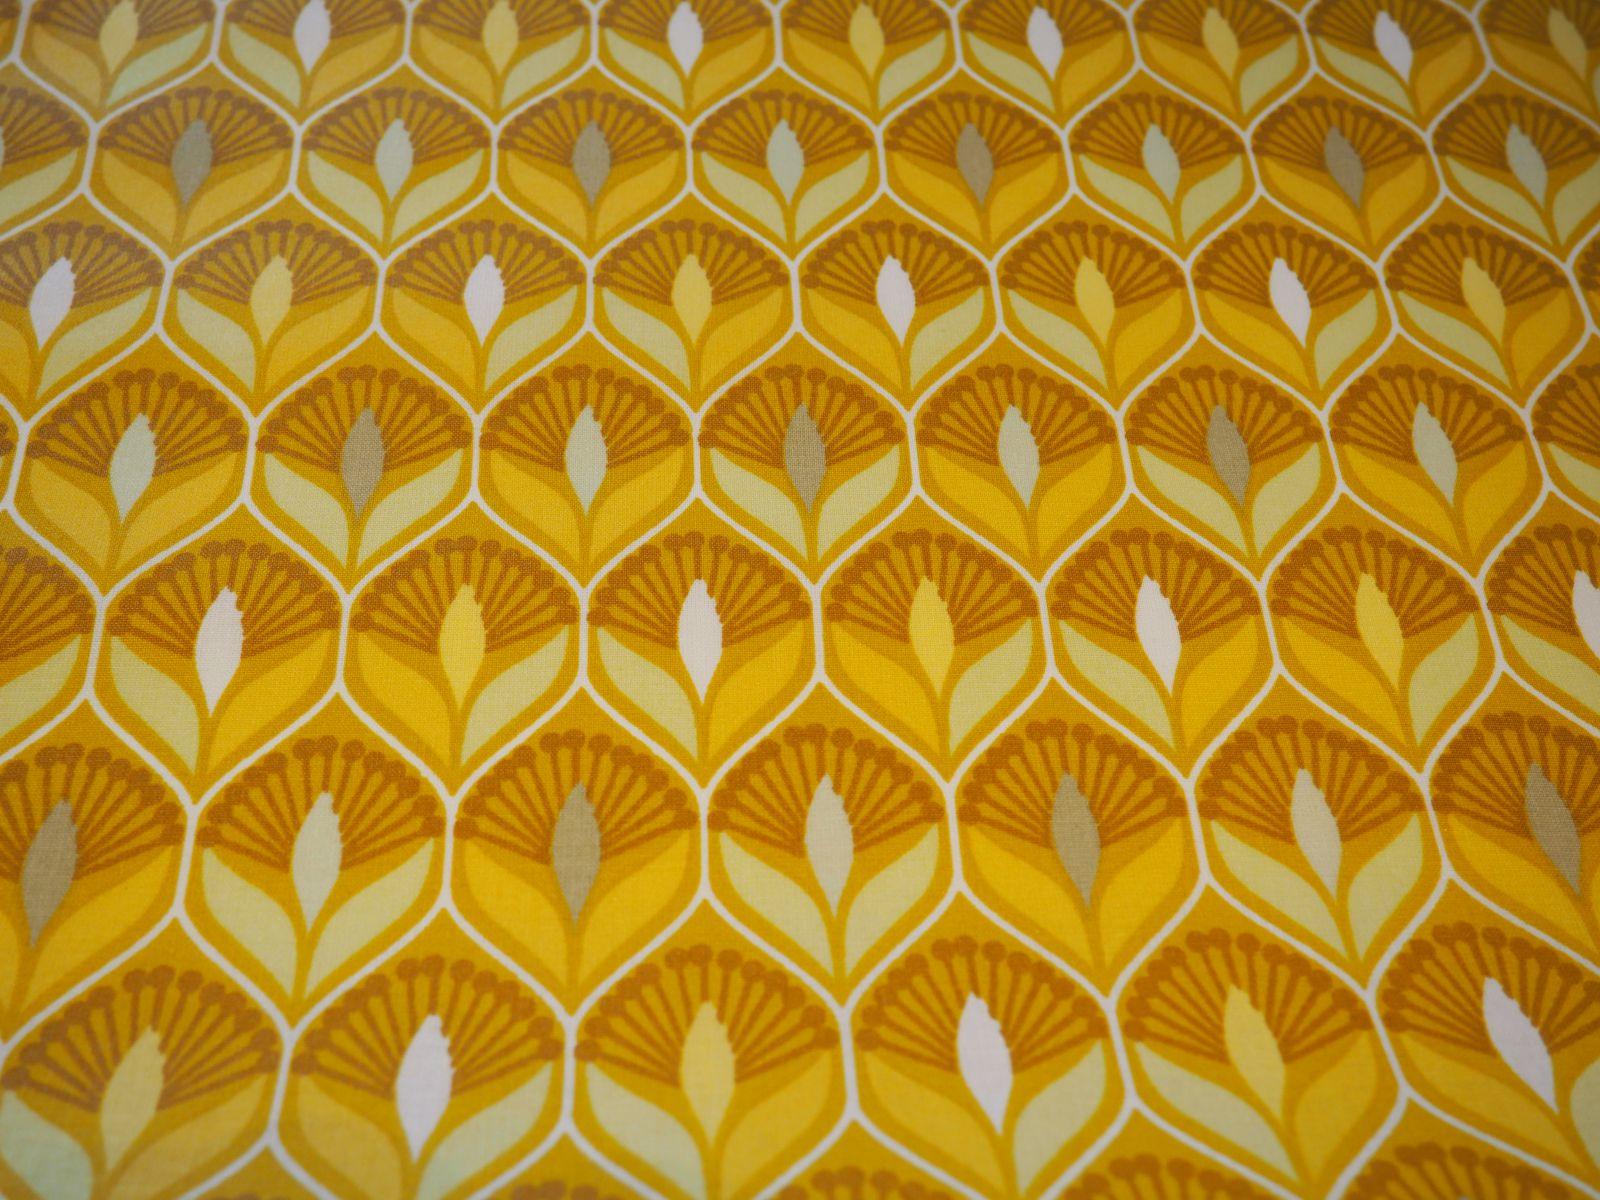 Gelamineerde katoen - Retrobloem geel